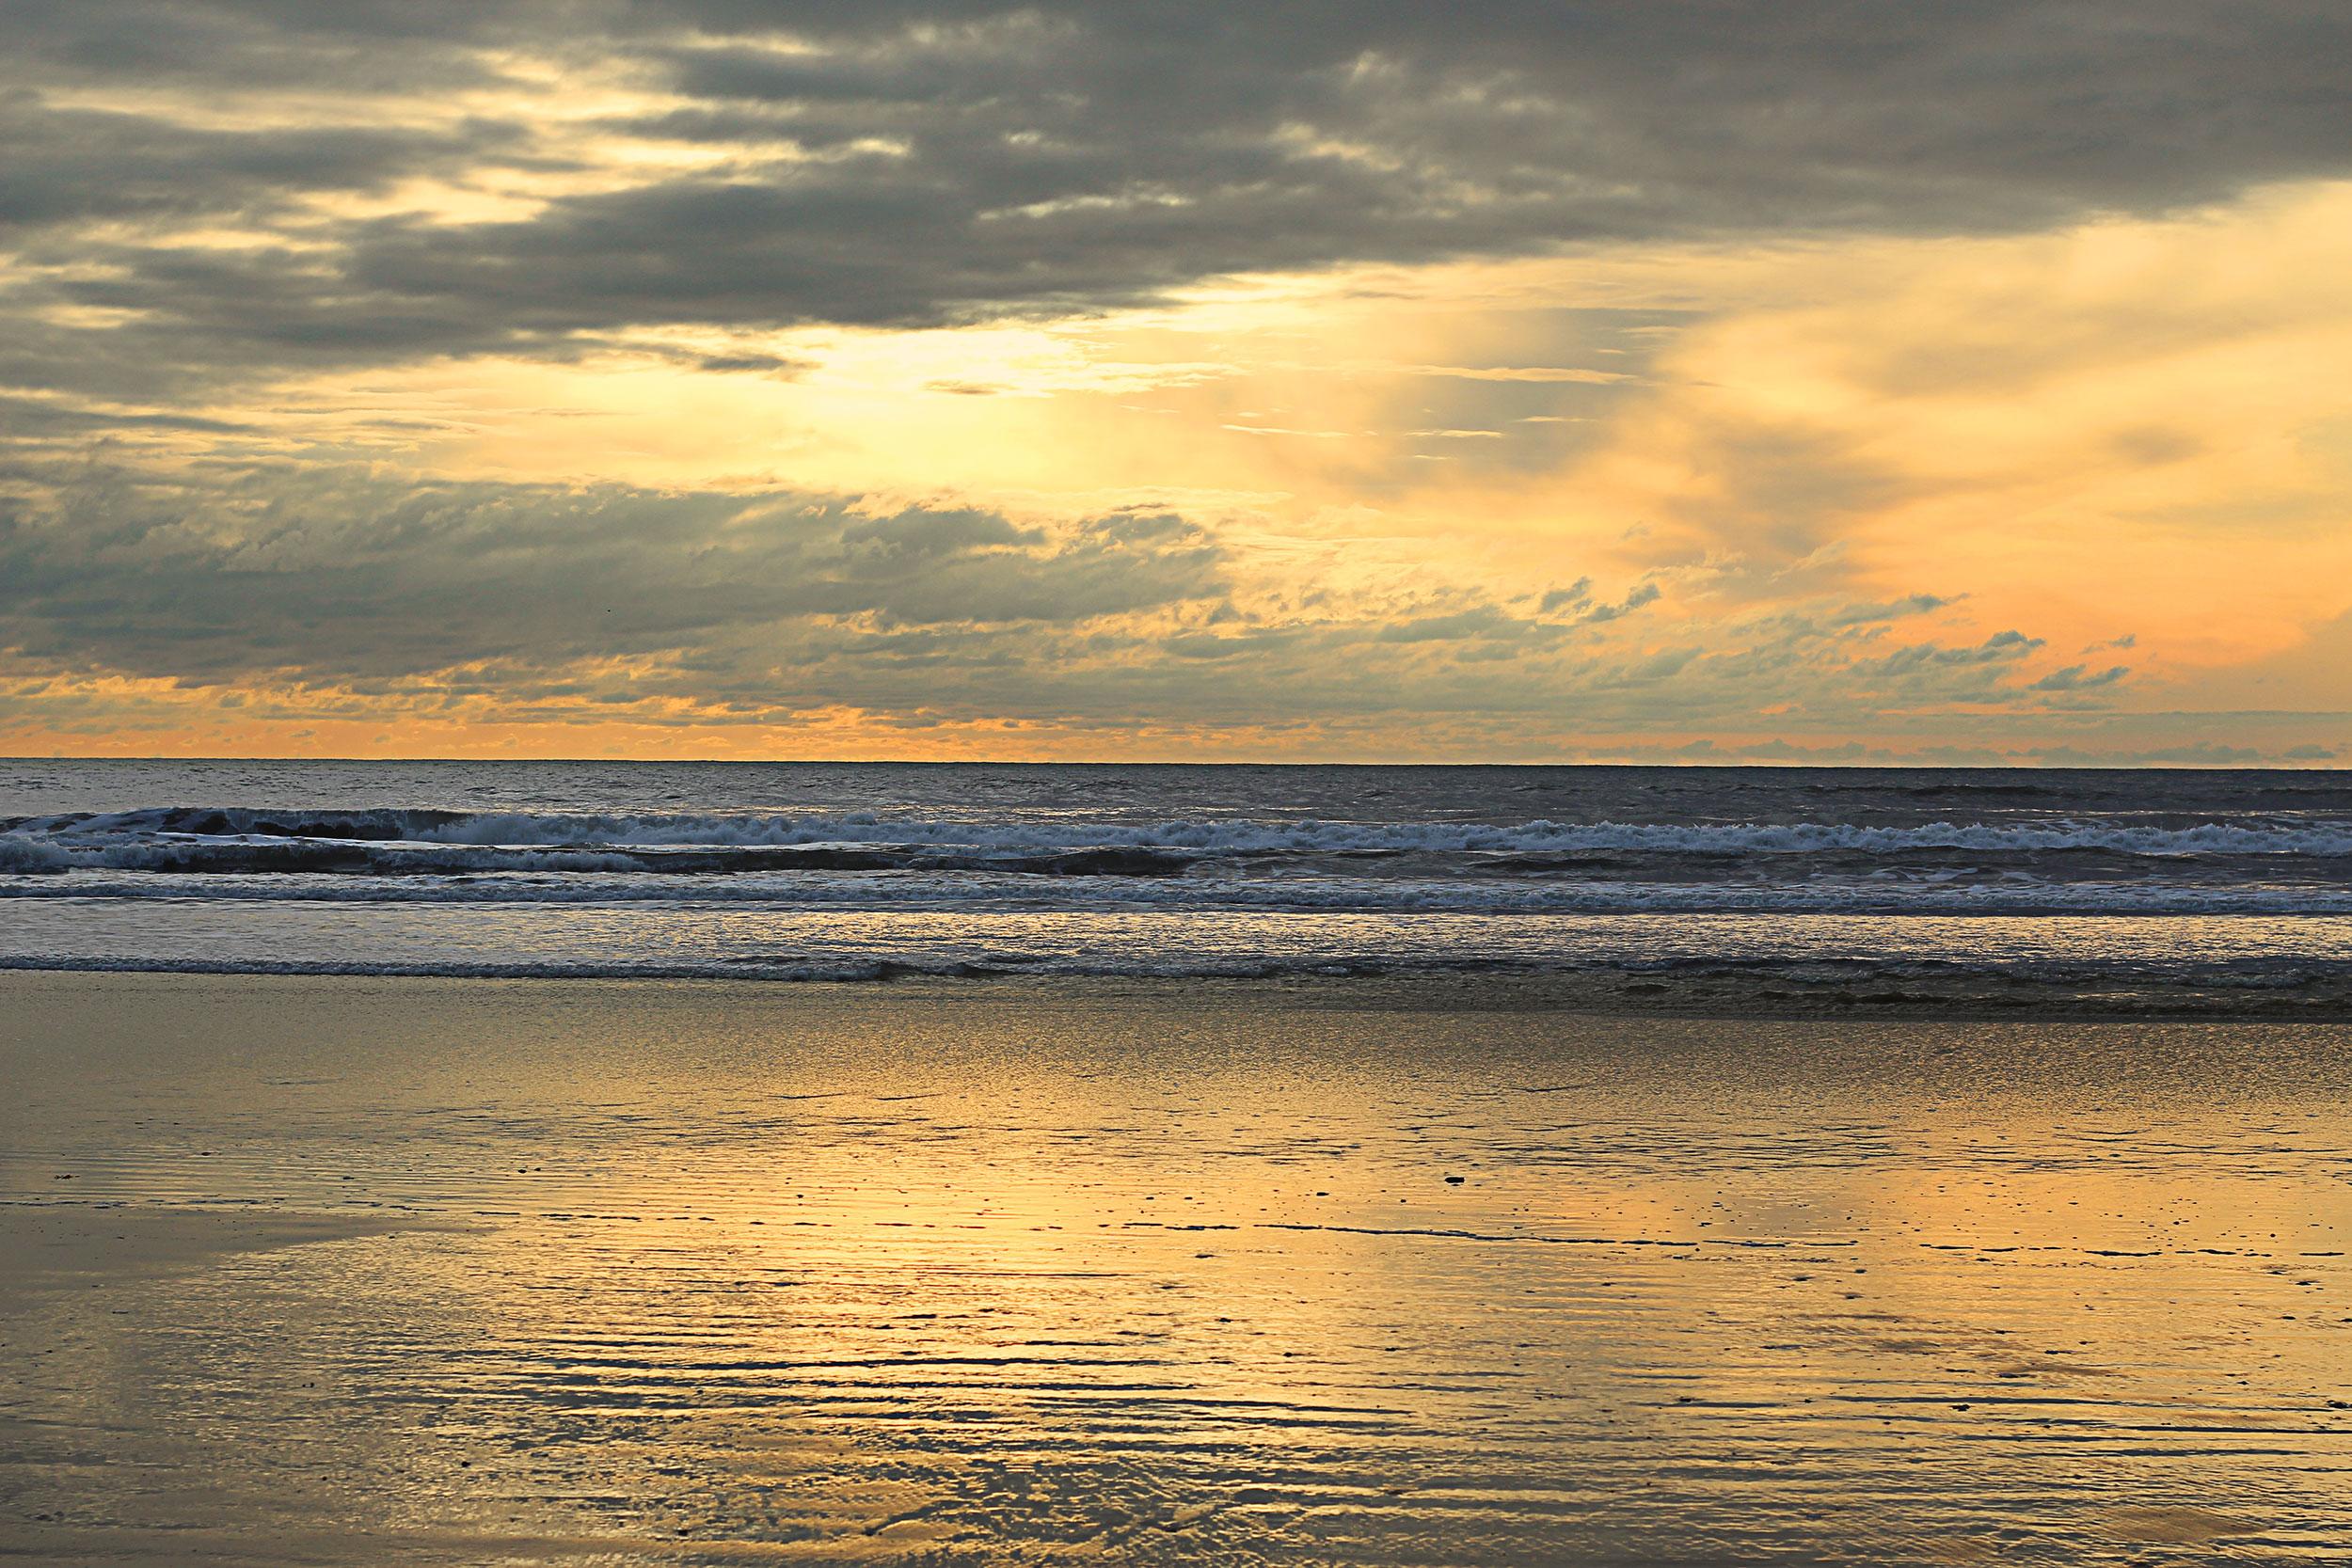 Morro-Strand-Beach2.jpg